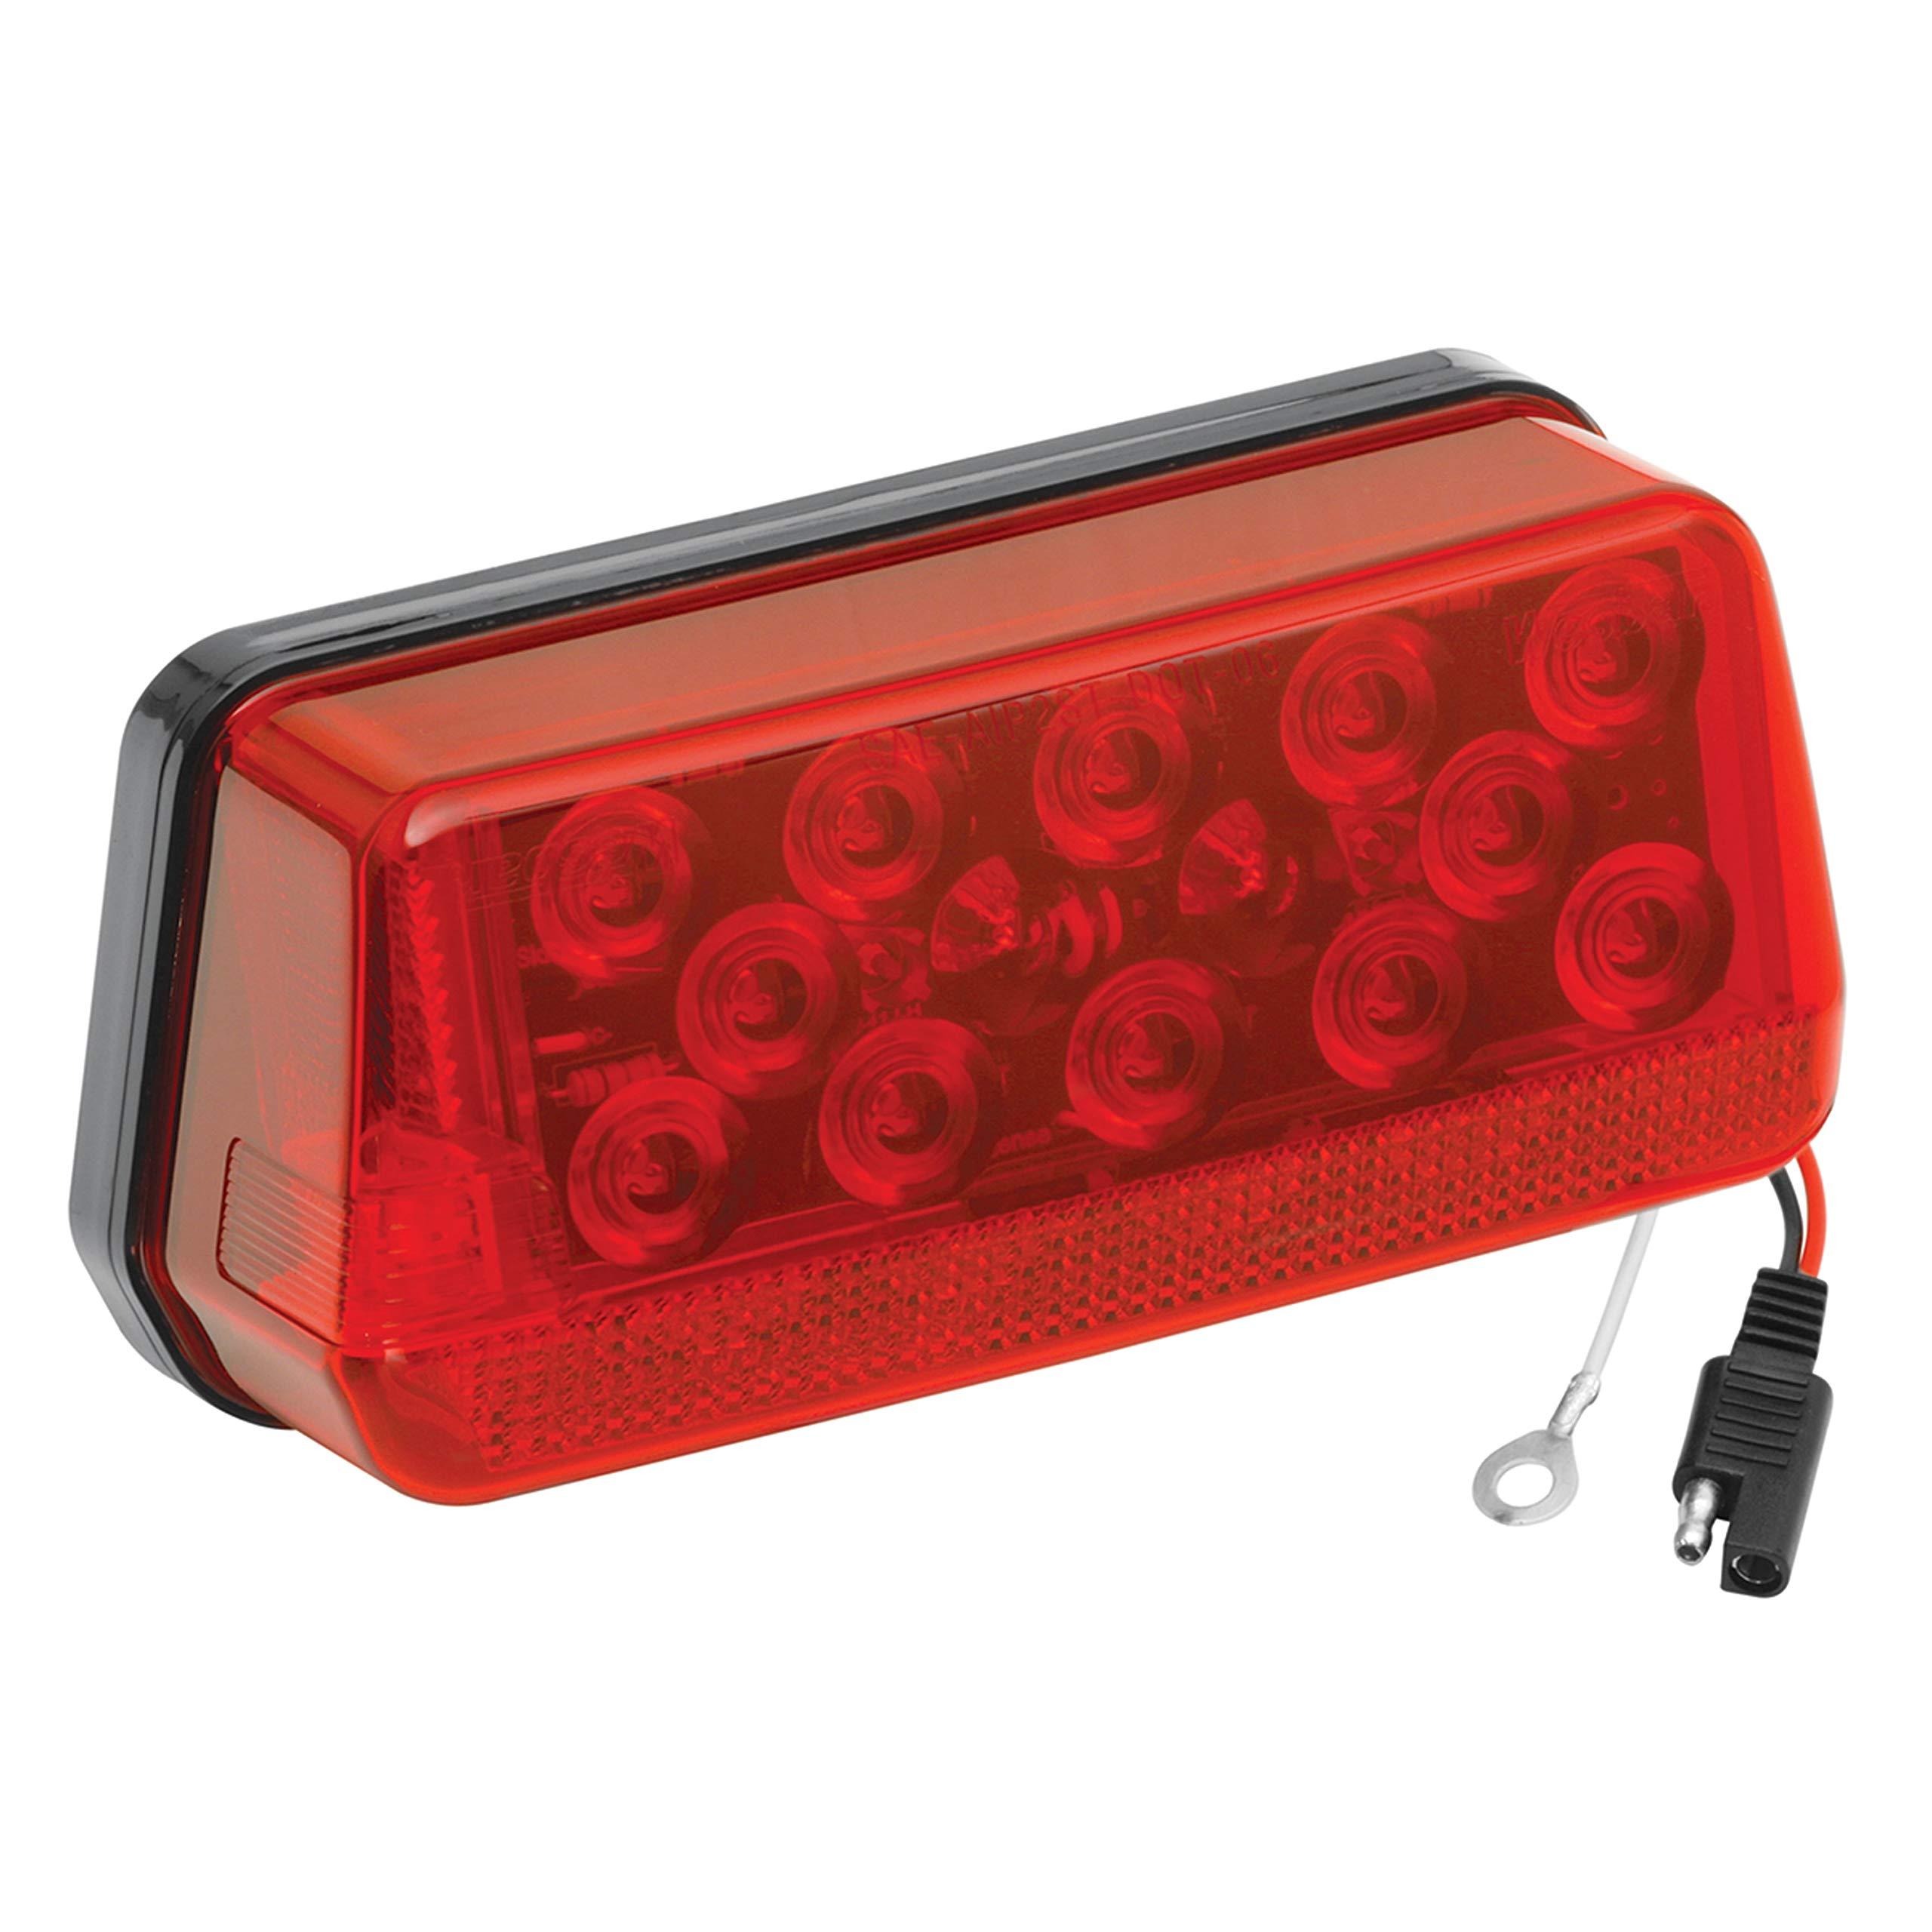 Wesbar 281595 Waterproof LED Wrap-Around Tail Light, Over 80'' Wide Trailer, Left/Roadside by Fulton